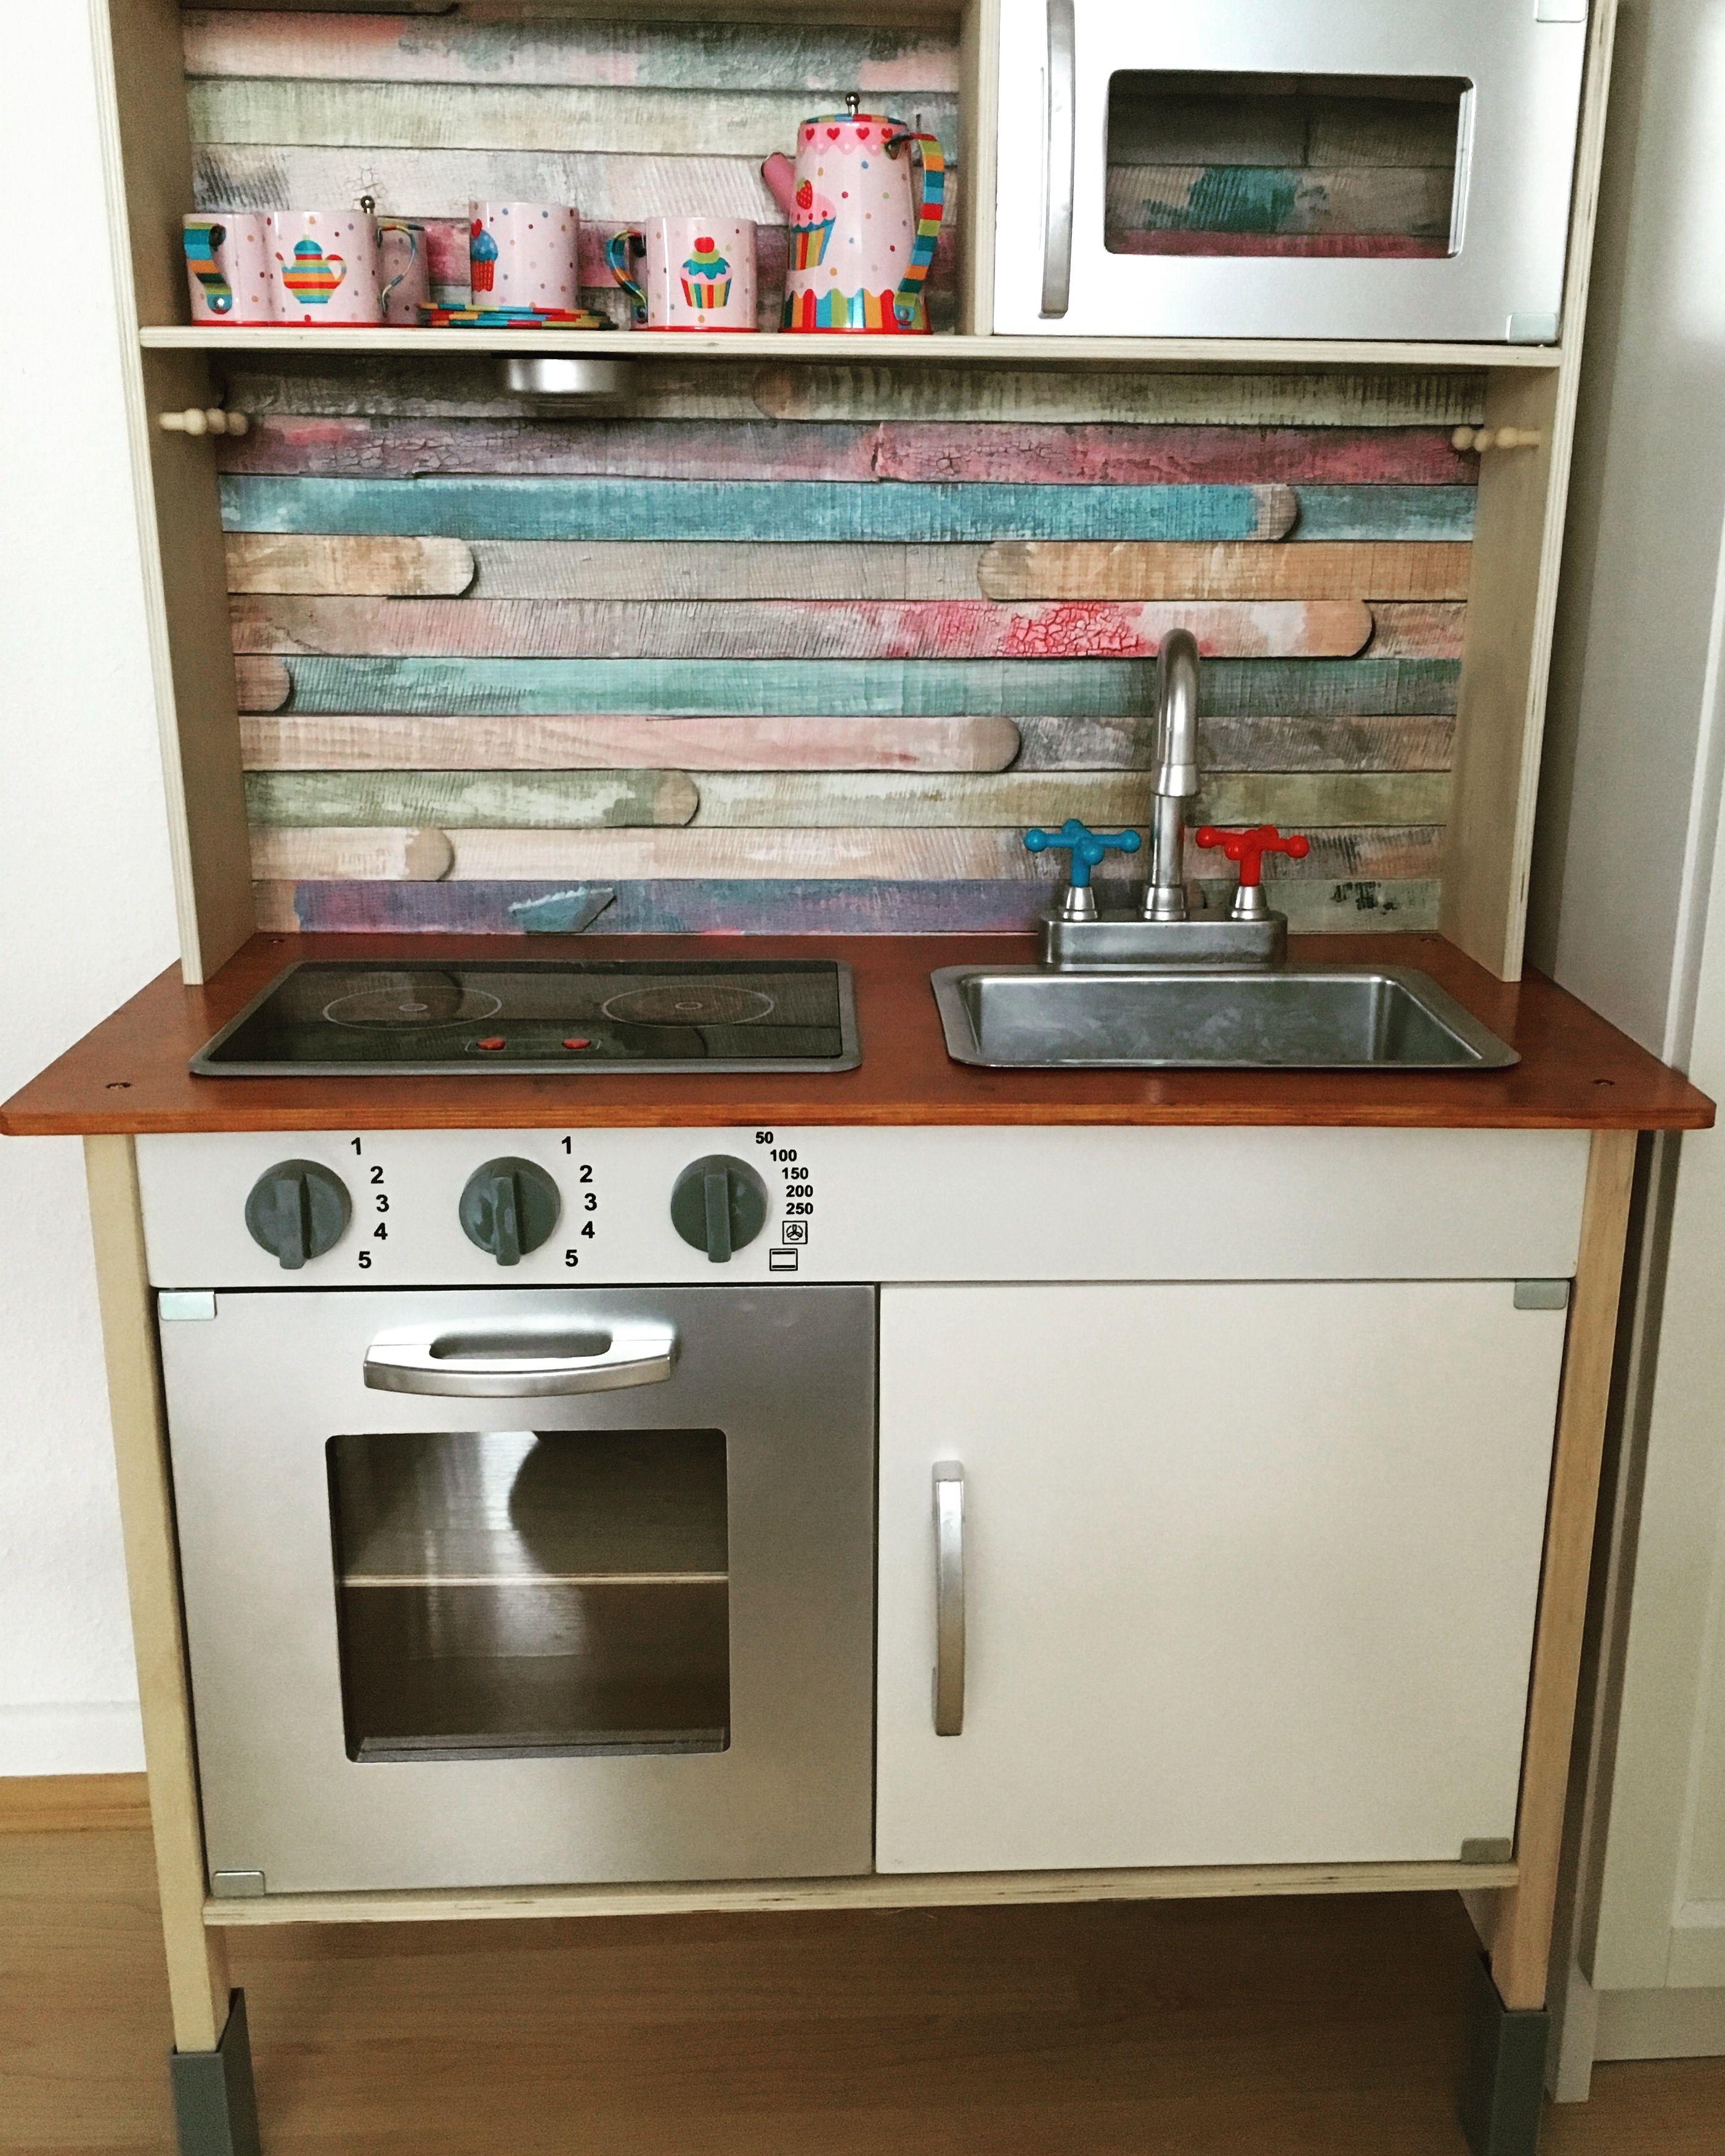 Ikea kinderküche pimpen  Aldi Kinderküche Spielküche pimp | Duktig | Pinterest ...